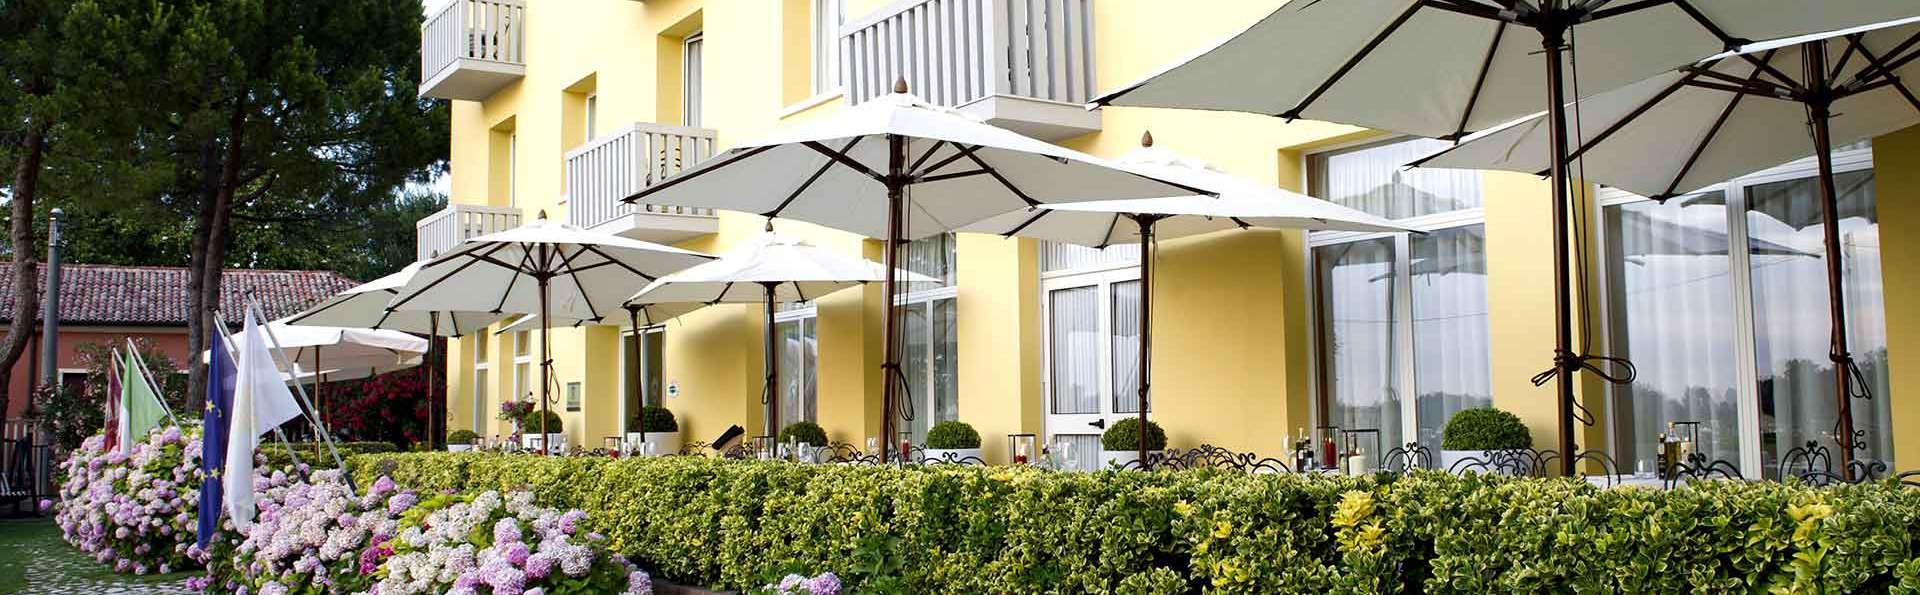 Viktoria Palace Hotel - Edit_Front.jpg